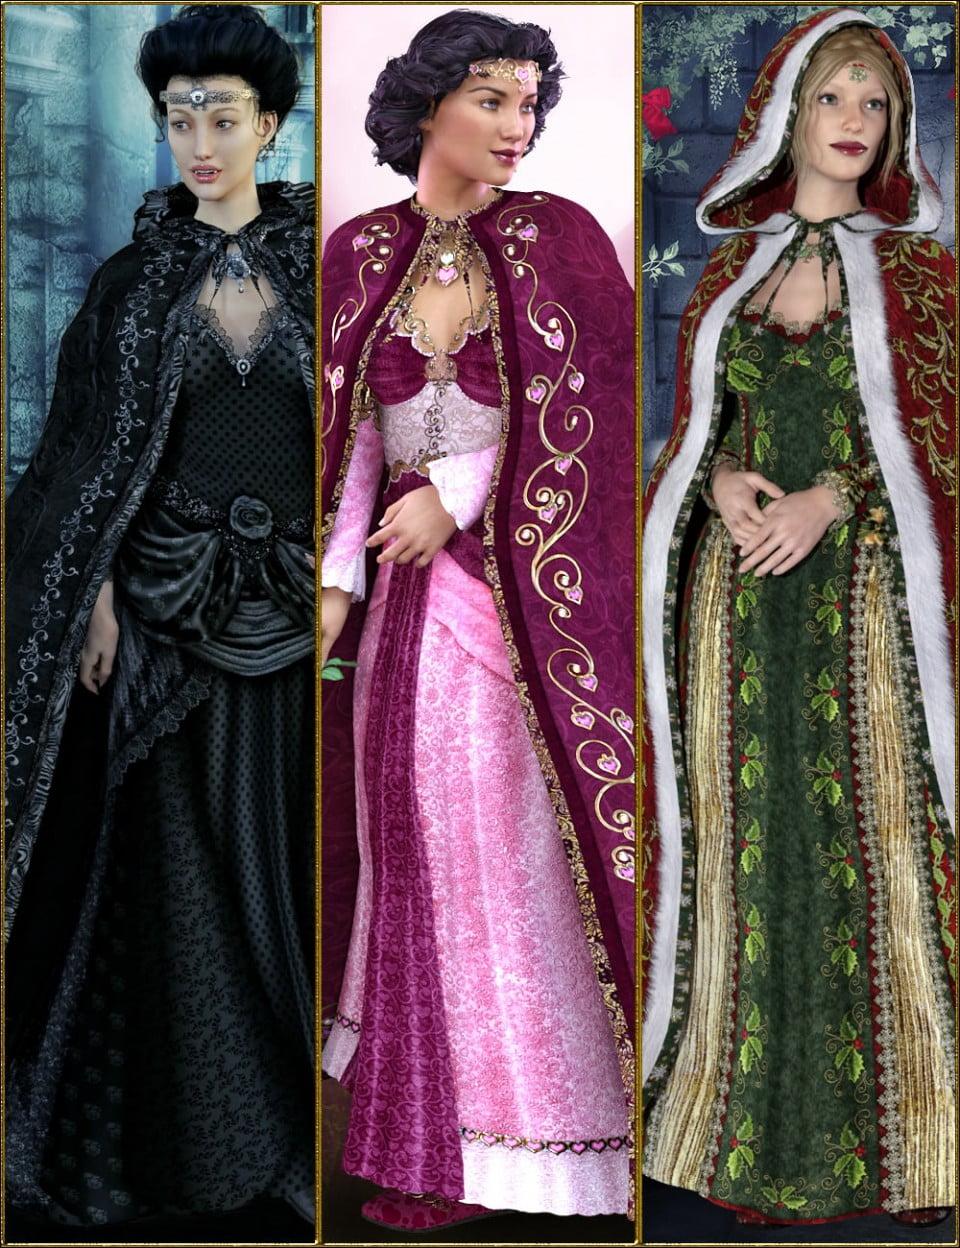 Iray Princesses Part 2 – Celebrations